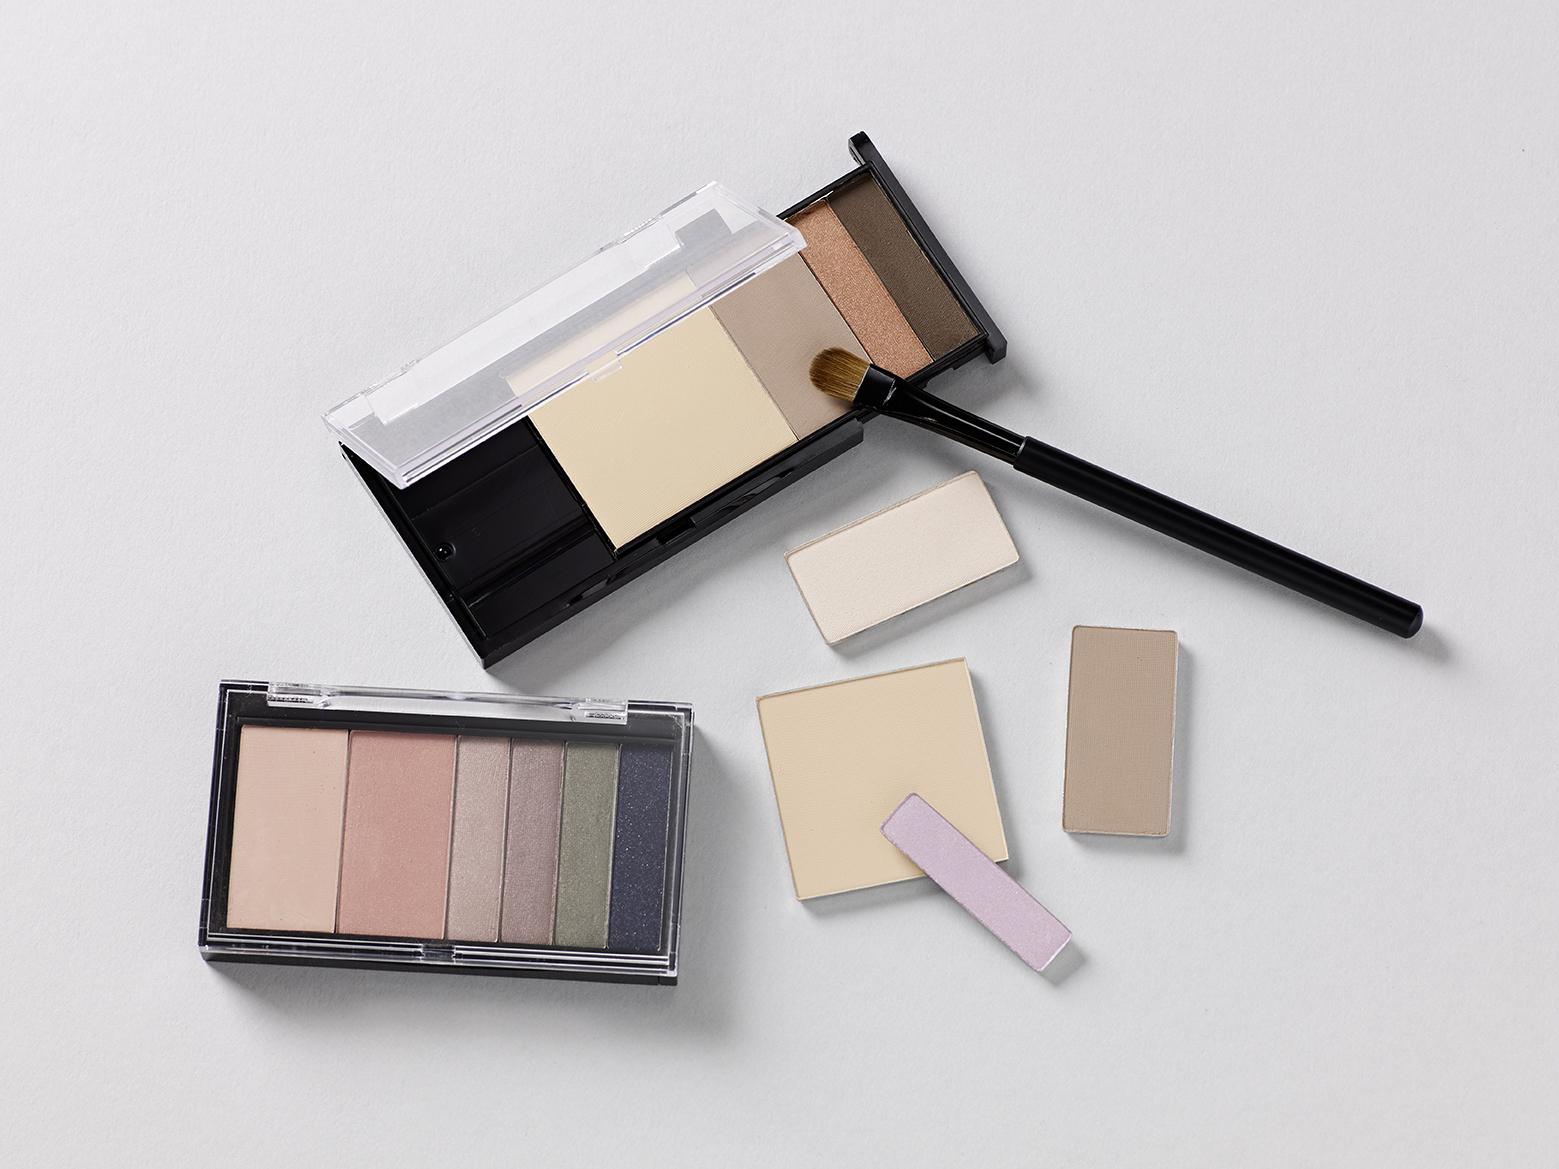 Matrix Refillable Make-up Palette